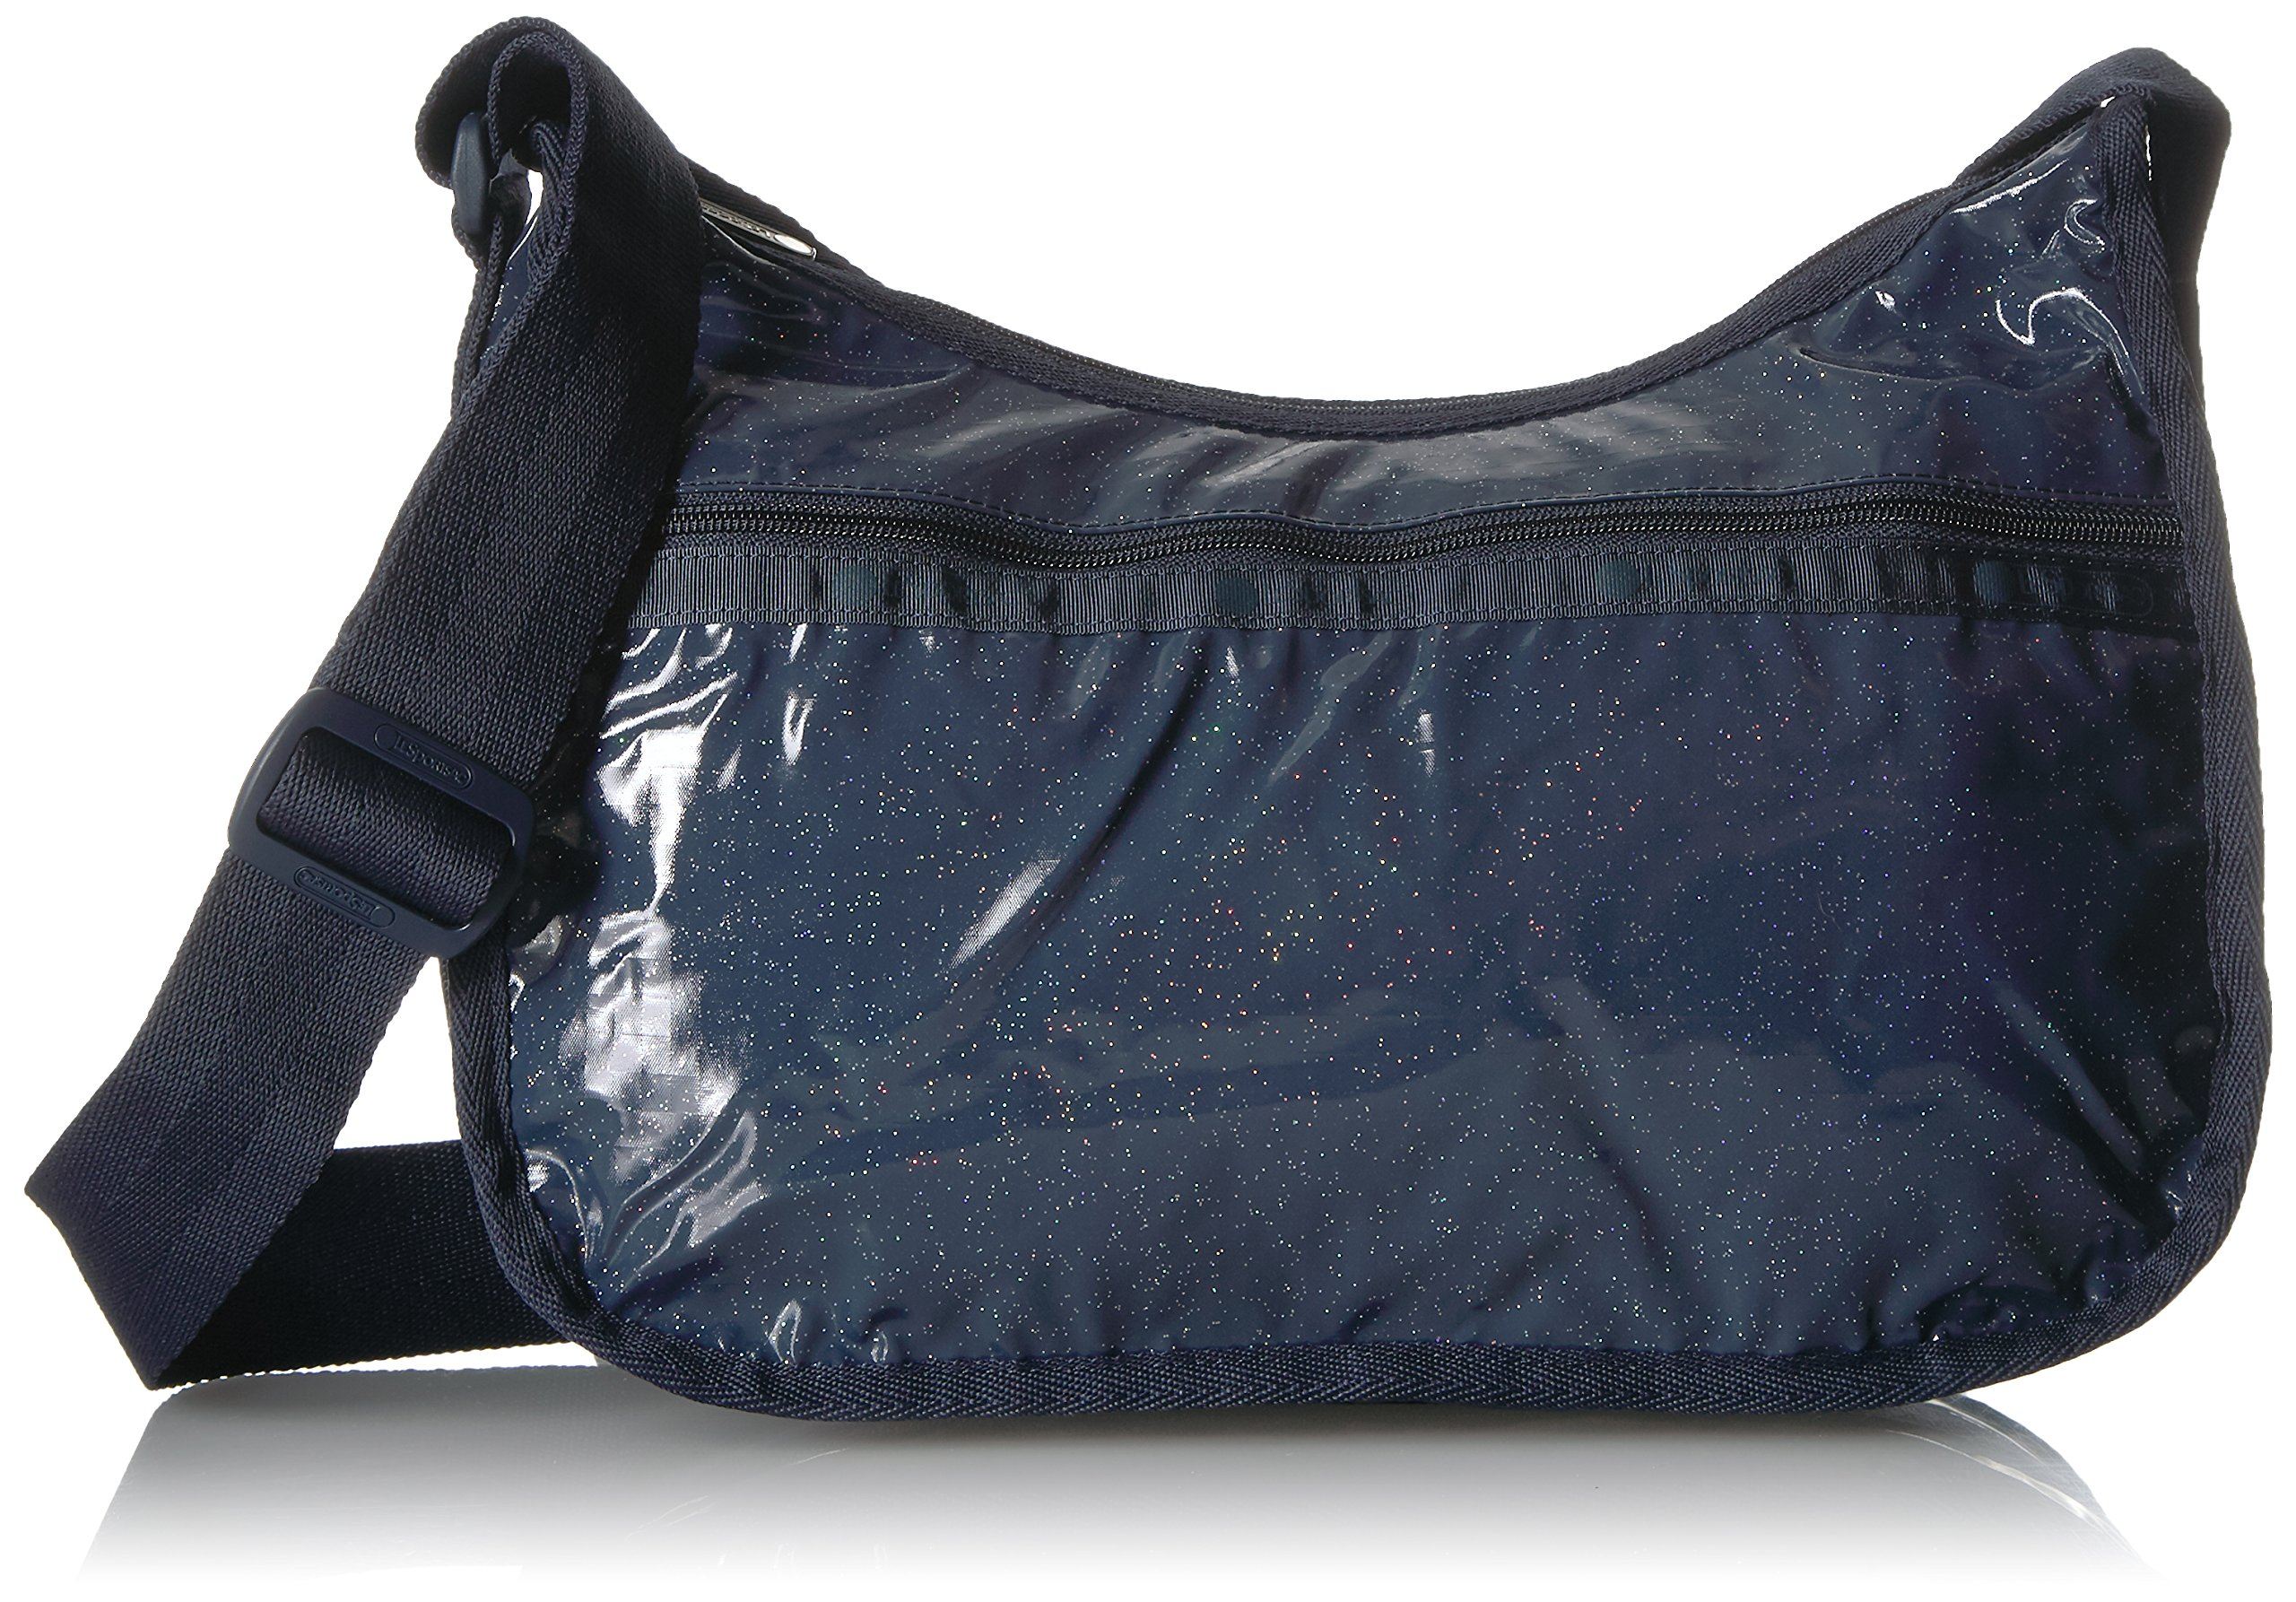 LeSportsac Classic Hobo Handbag, Astro Glitter